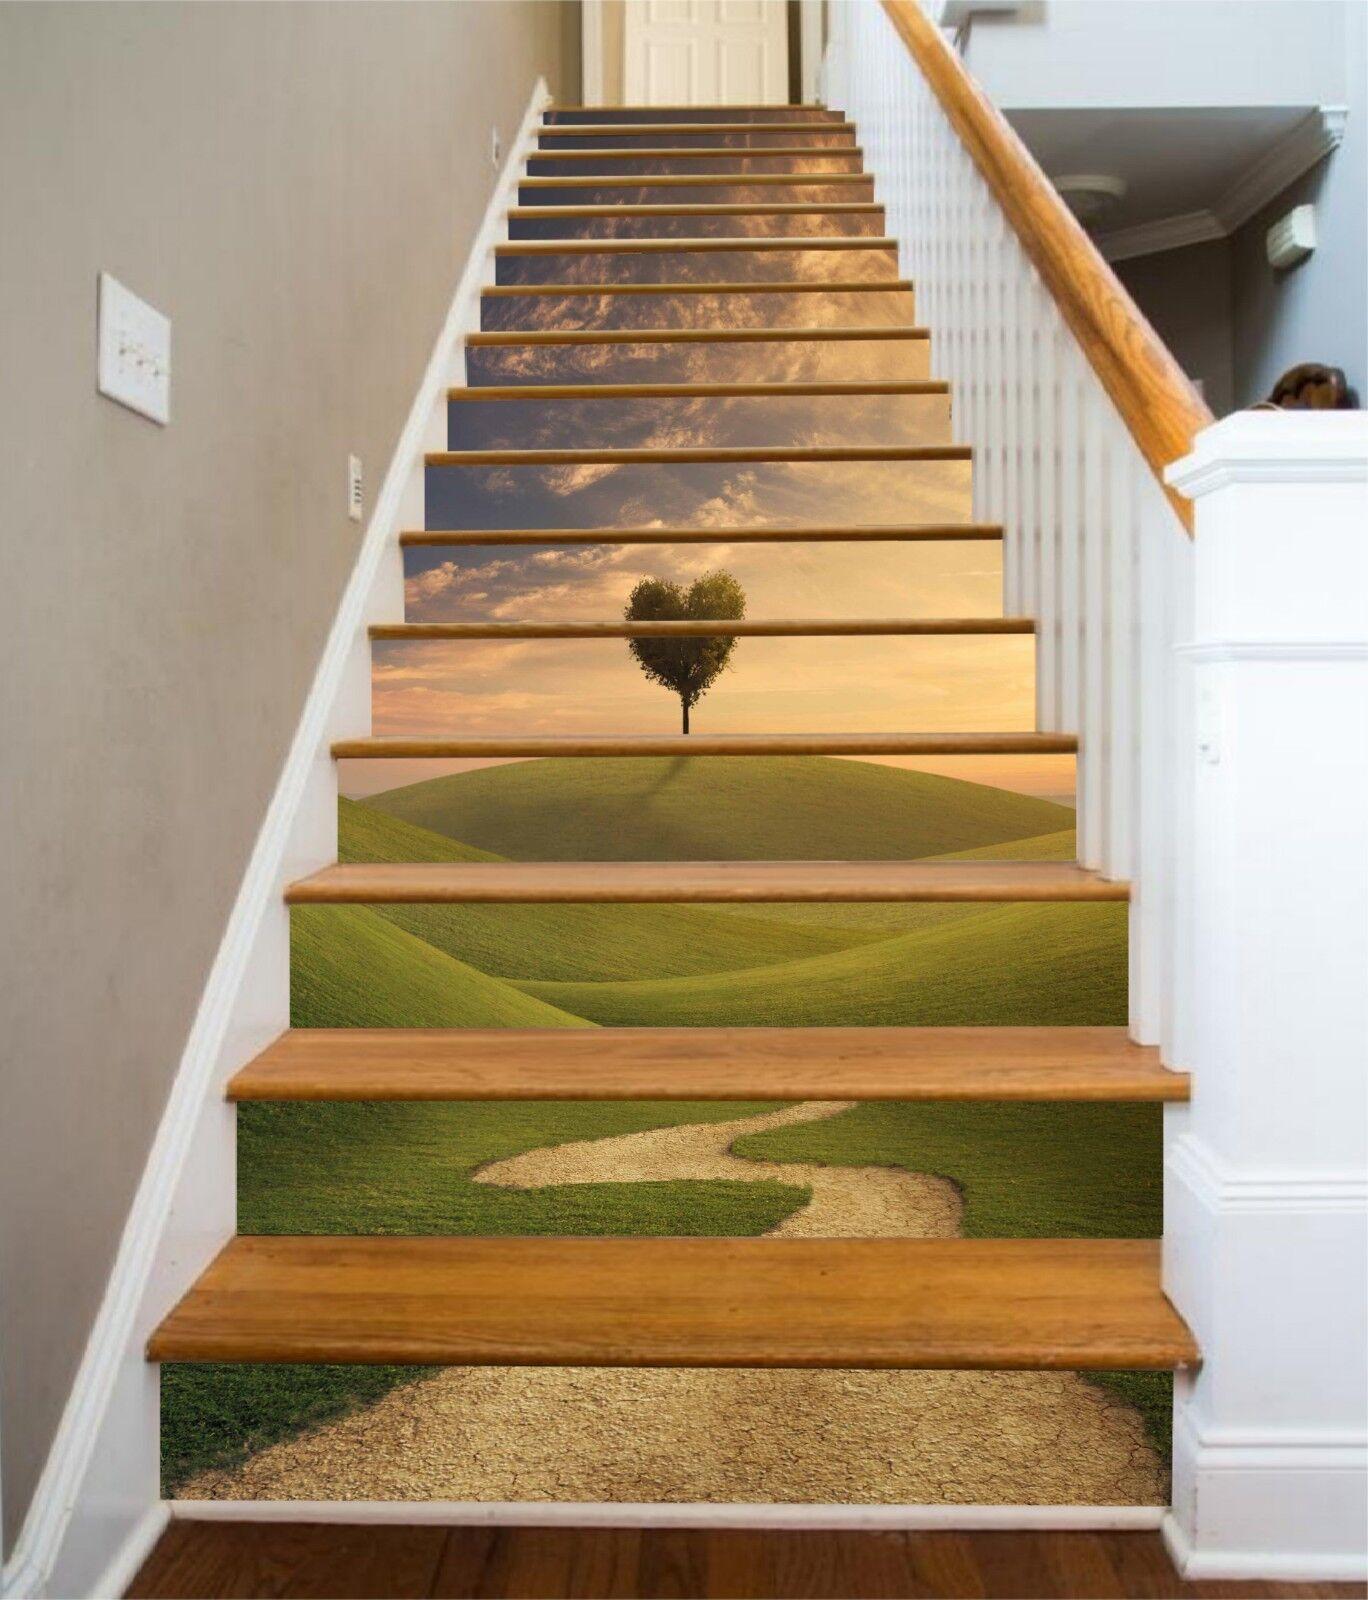 3D greenland-Baum 30 Stair Risers Dekoration Fototapete Vinyl Aufkleber Tapete DE